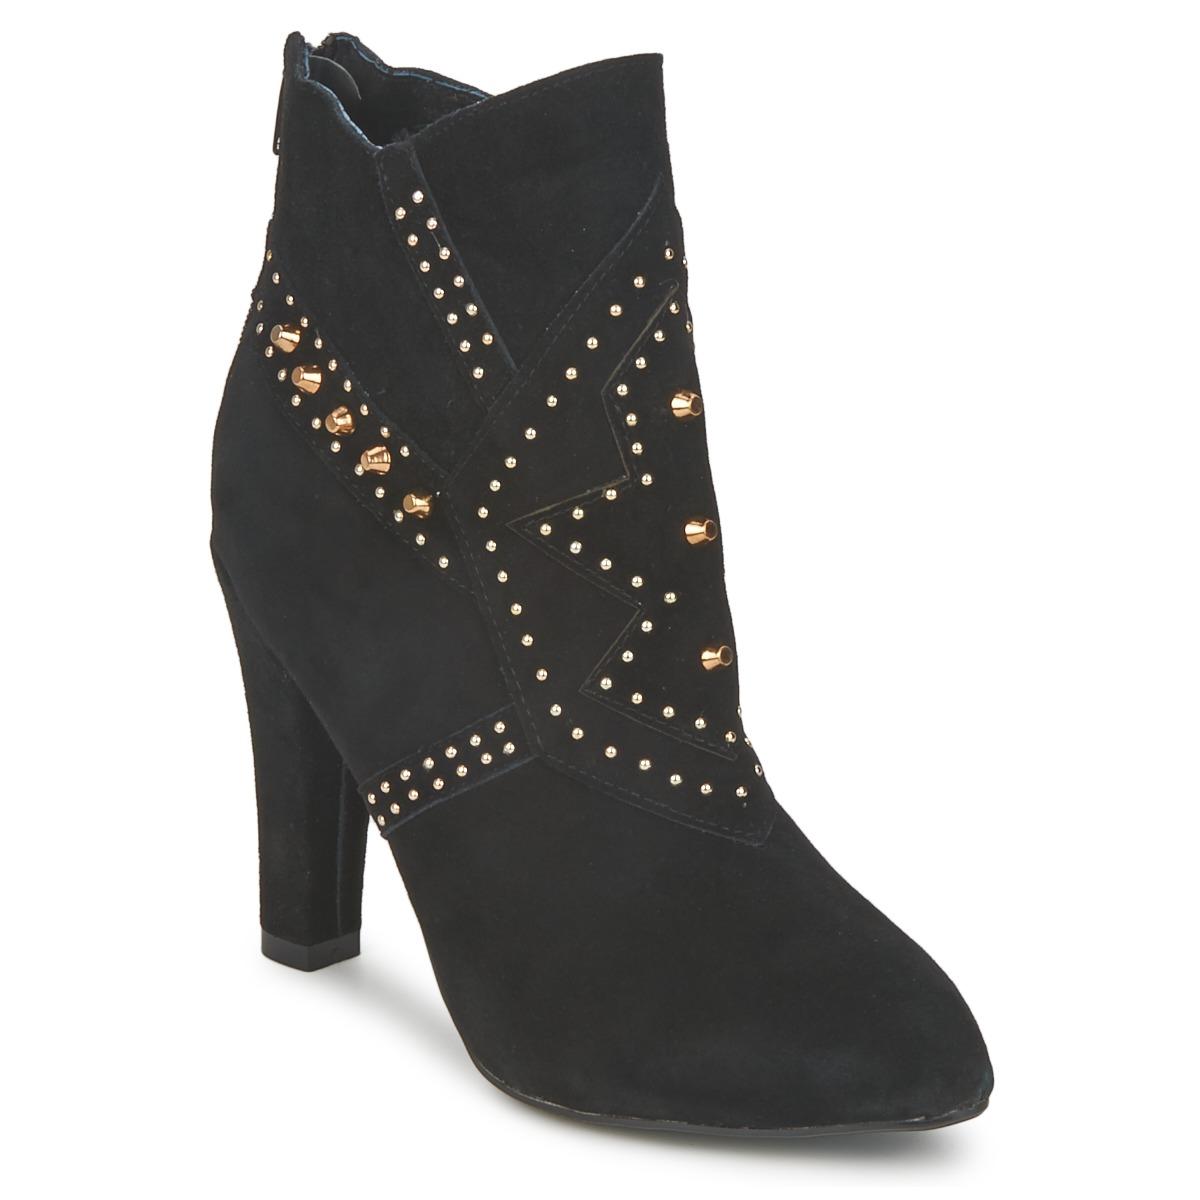 Friis & Company MIXA ERIN Schwarz - Kostenloser Versand bei Spartoode ! - Schuhe Low Boots Damen 54,50 €